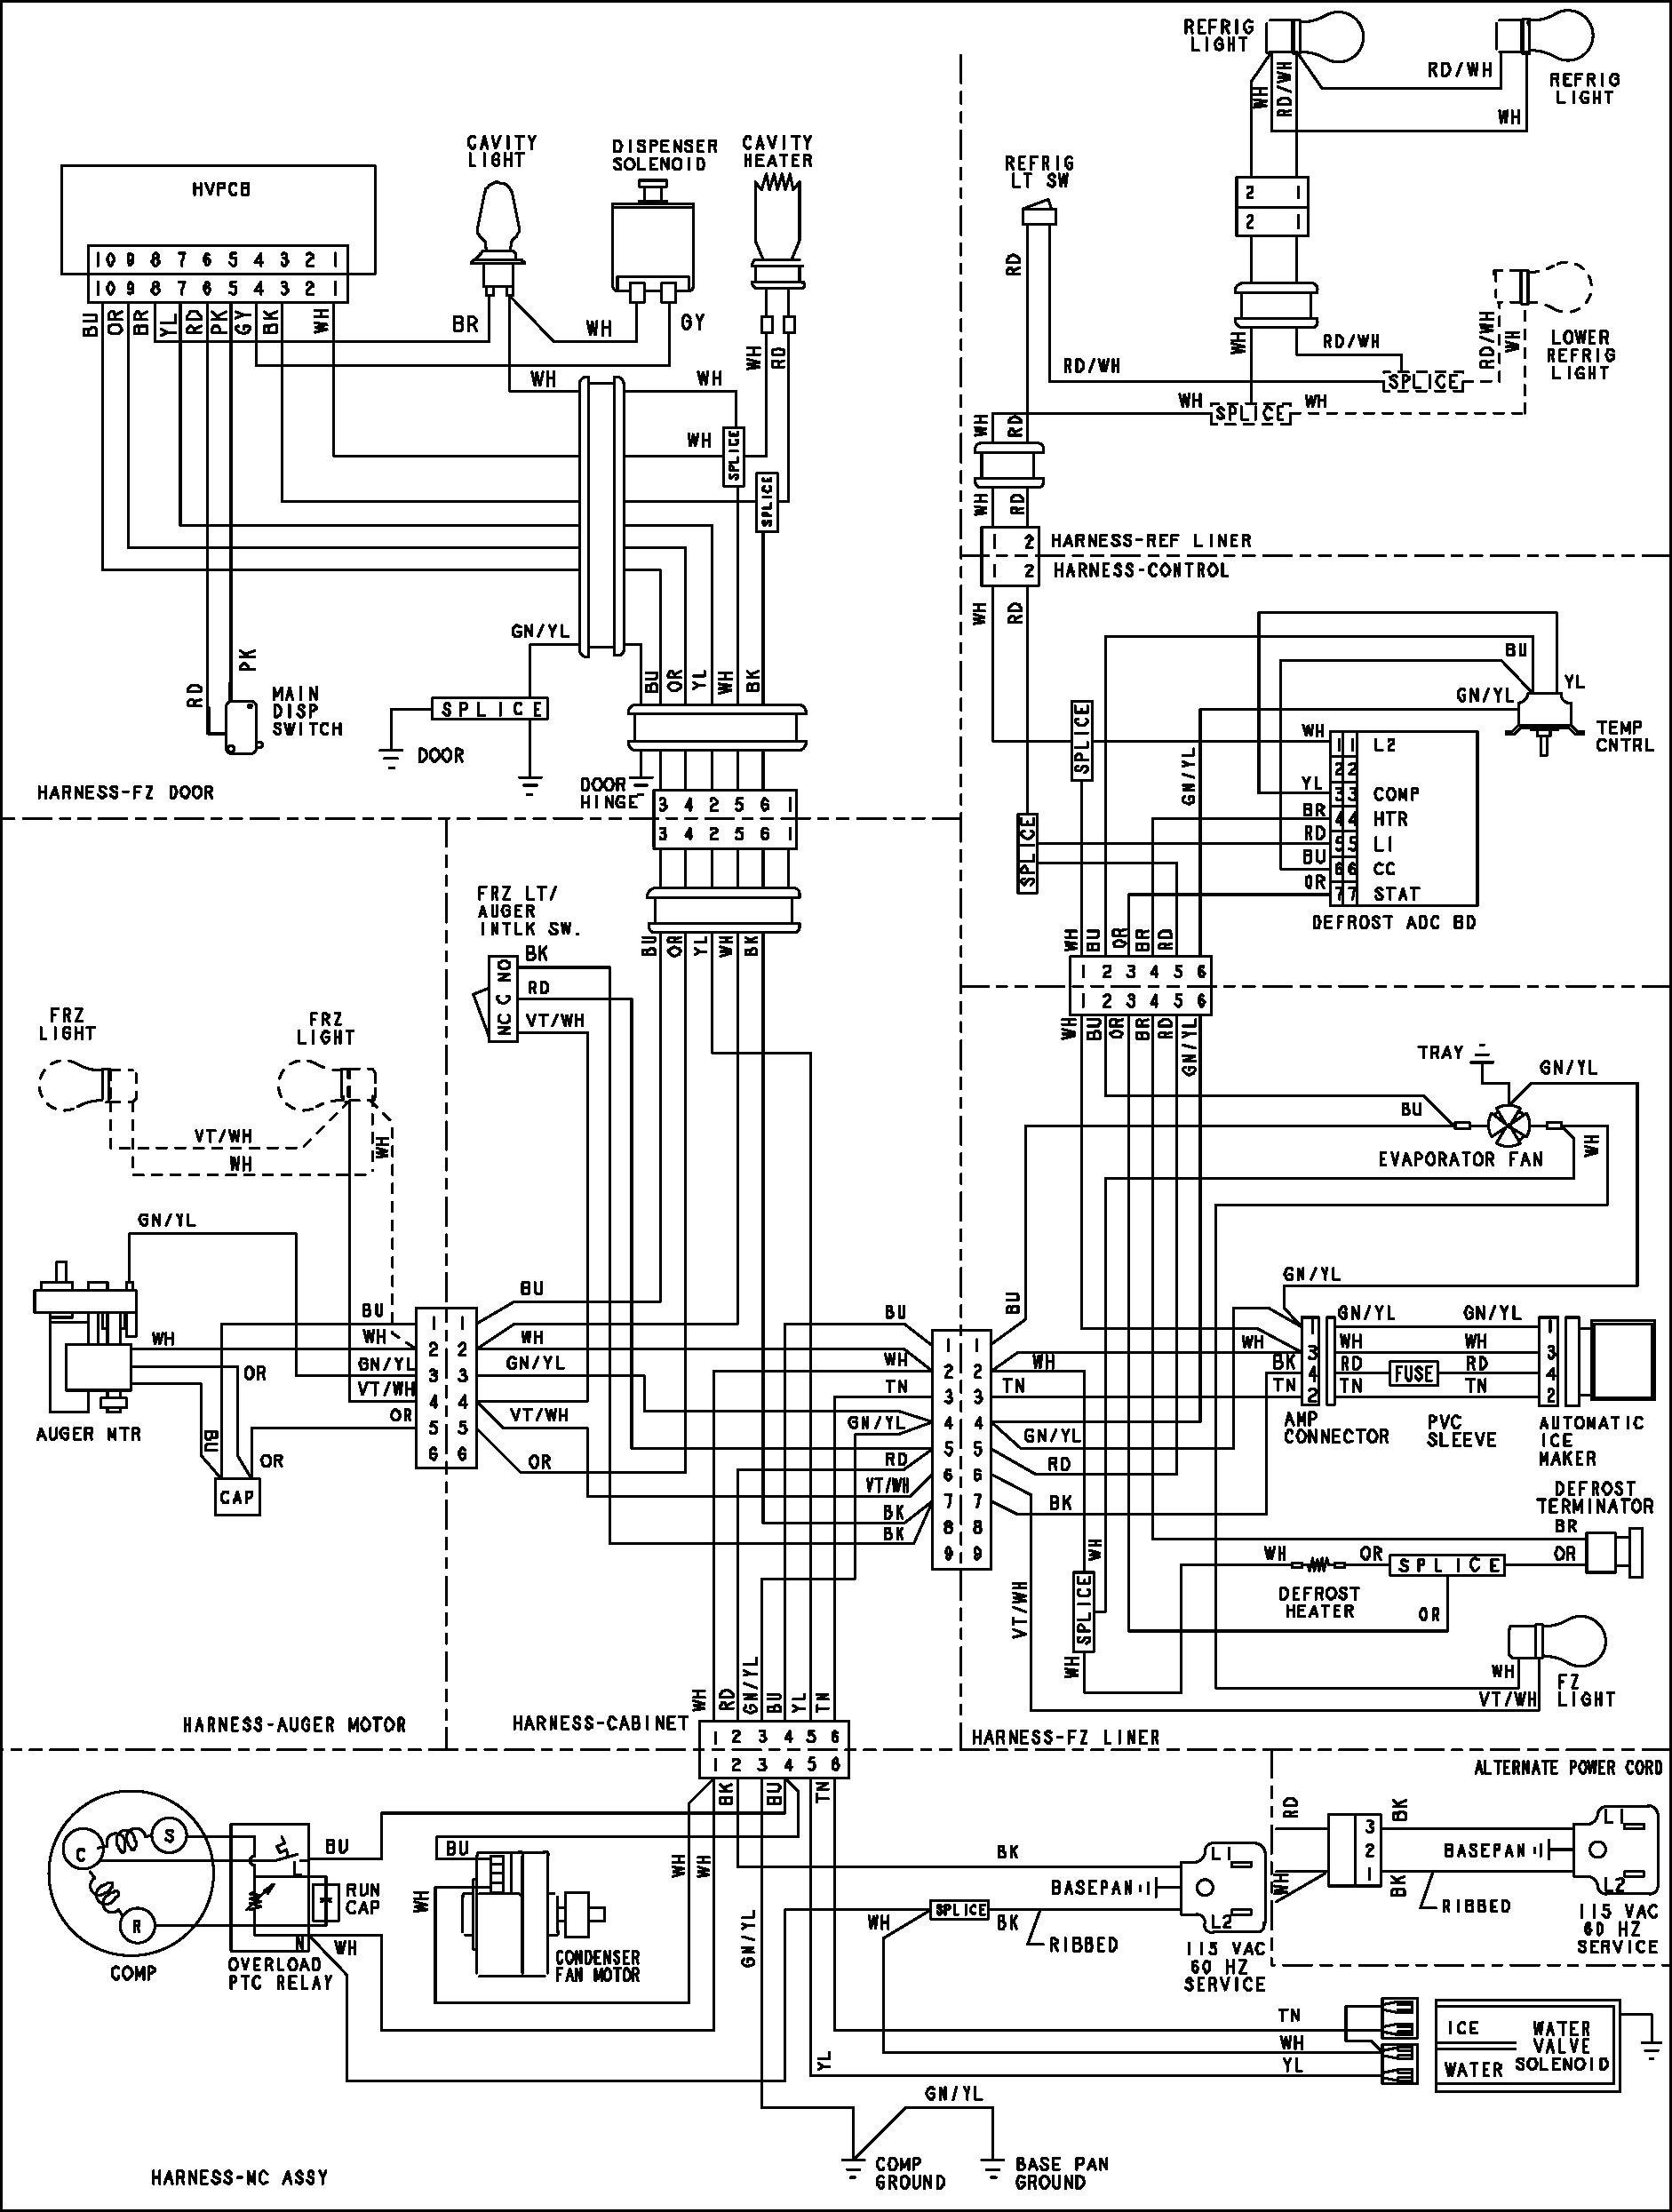 Amana Ptc40a40gc Wiring Diagrams   CCTV Wiring Diagram component ...